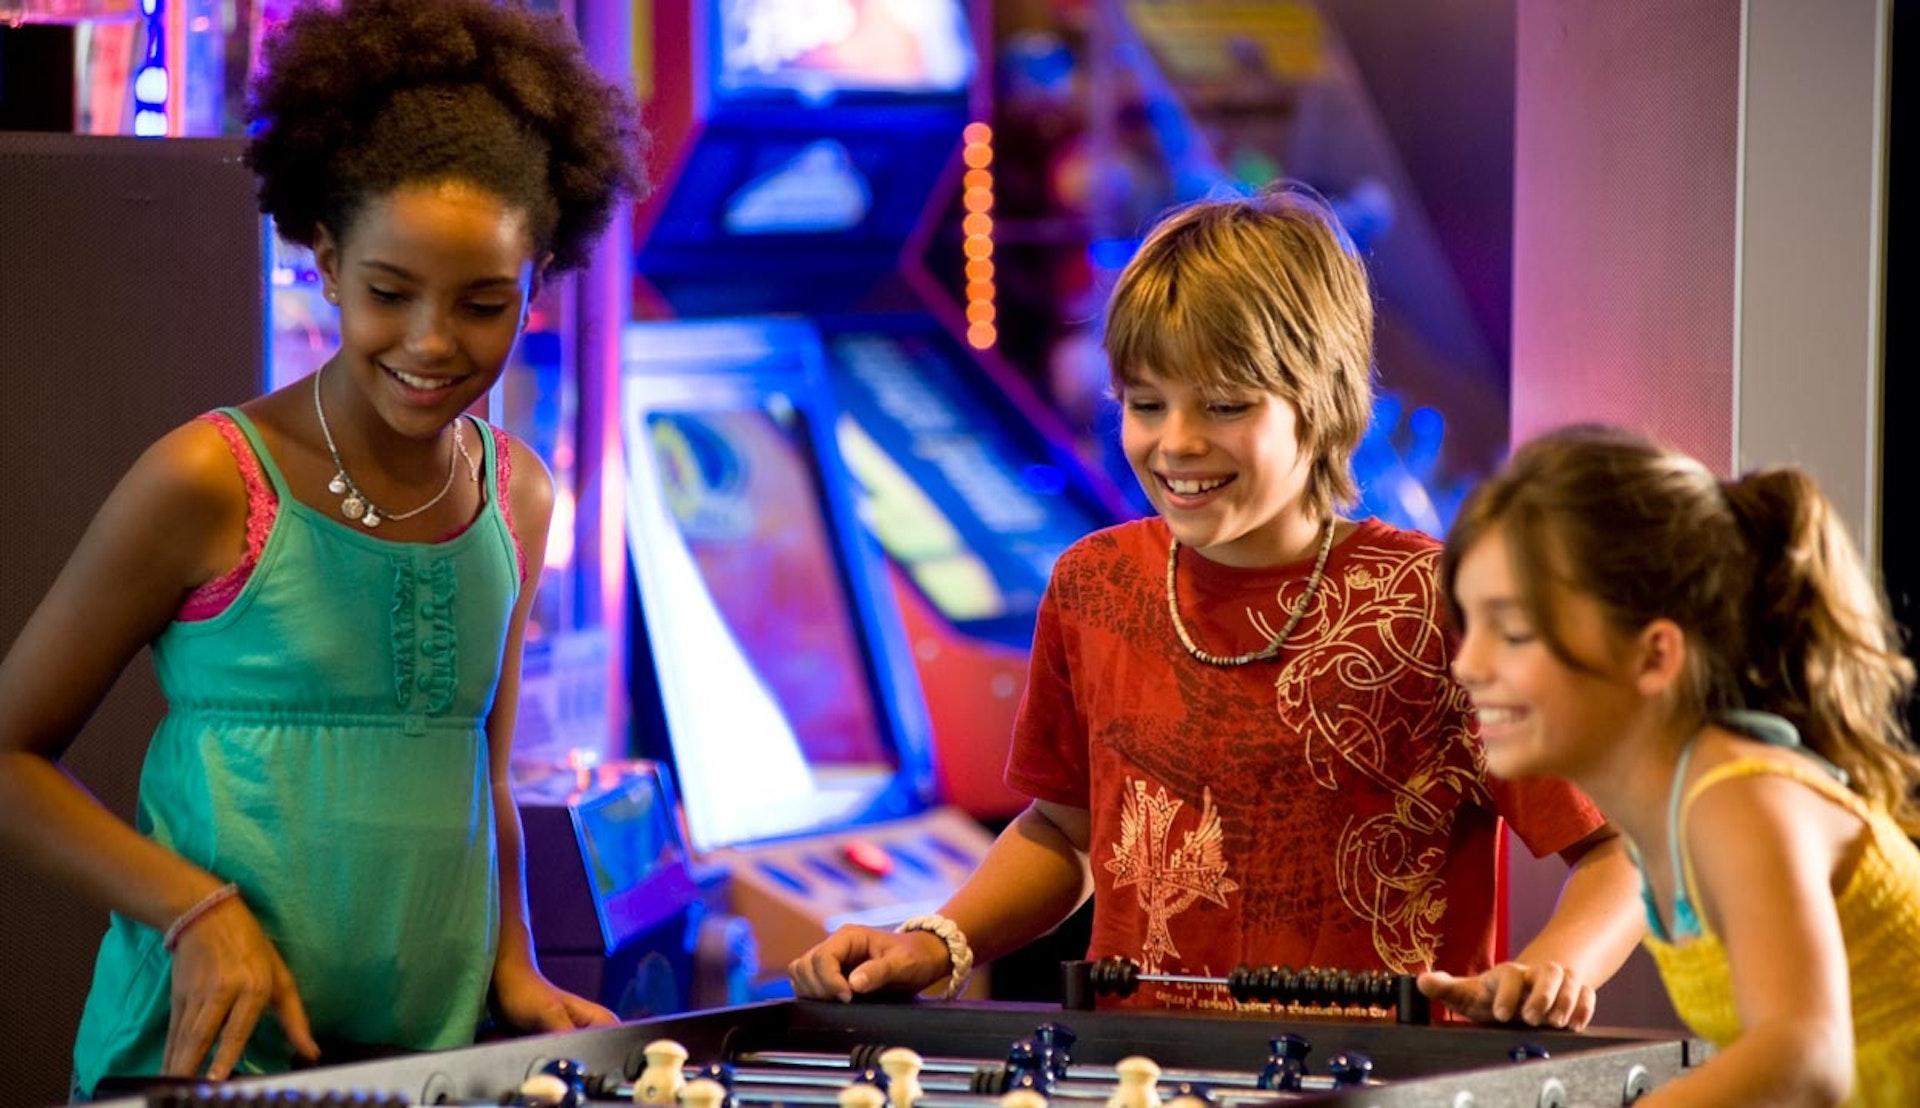 Barn spelar spel på Kids Club ombord på Royal Caribbeans fartyg.